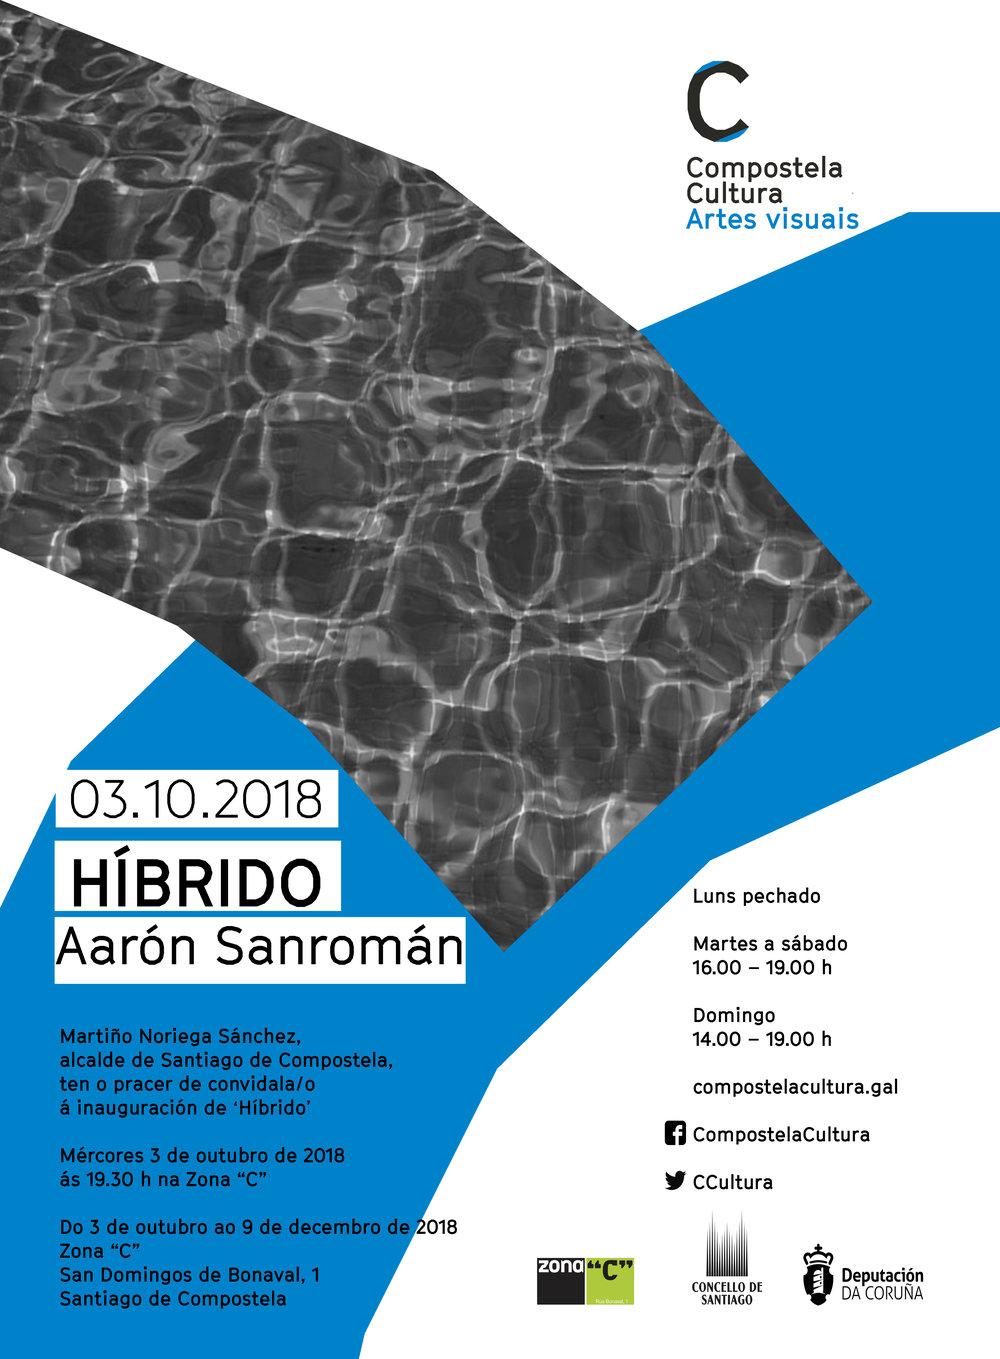 Hïbrido Aáron Sanromán